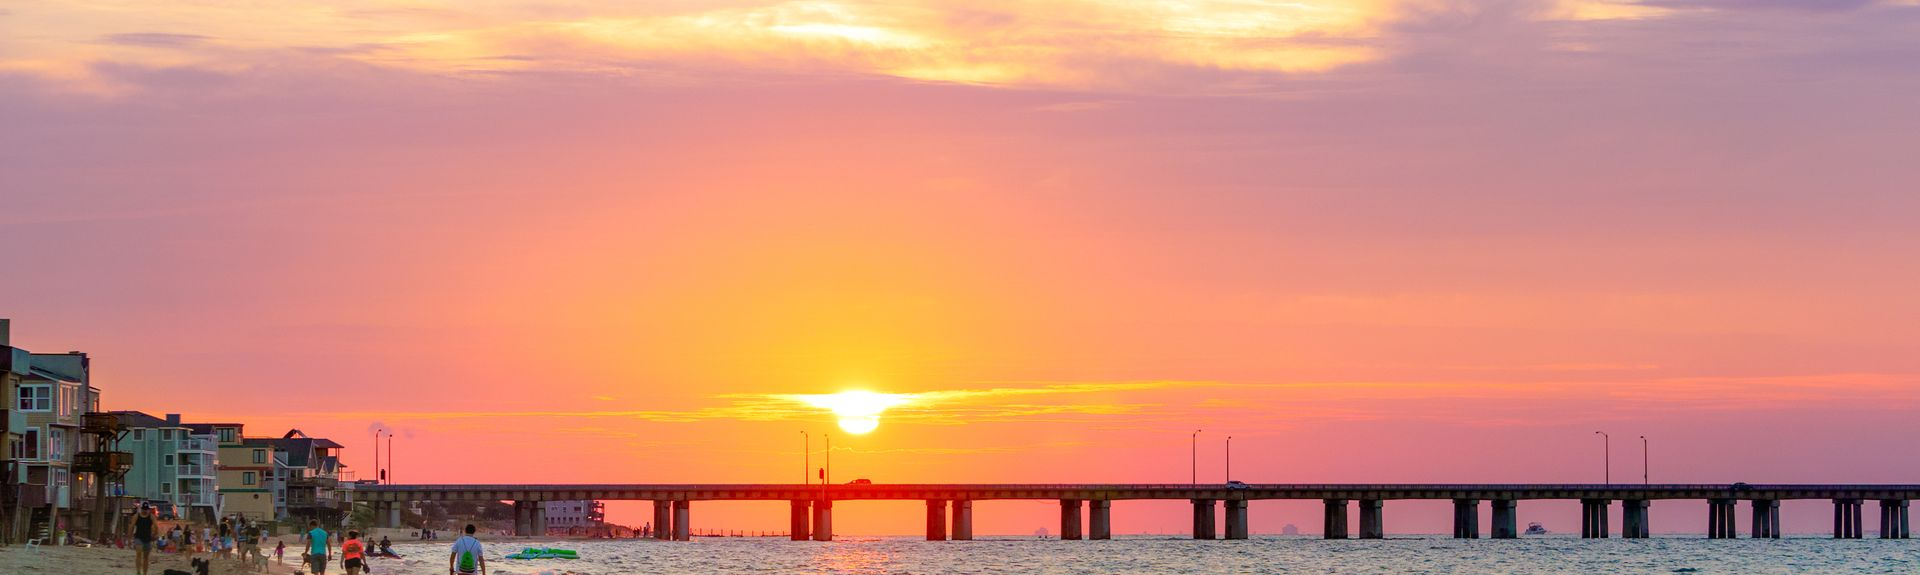 Chesapeake Bay, USA